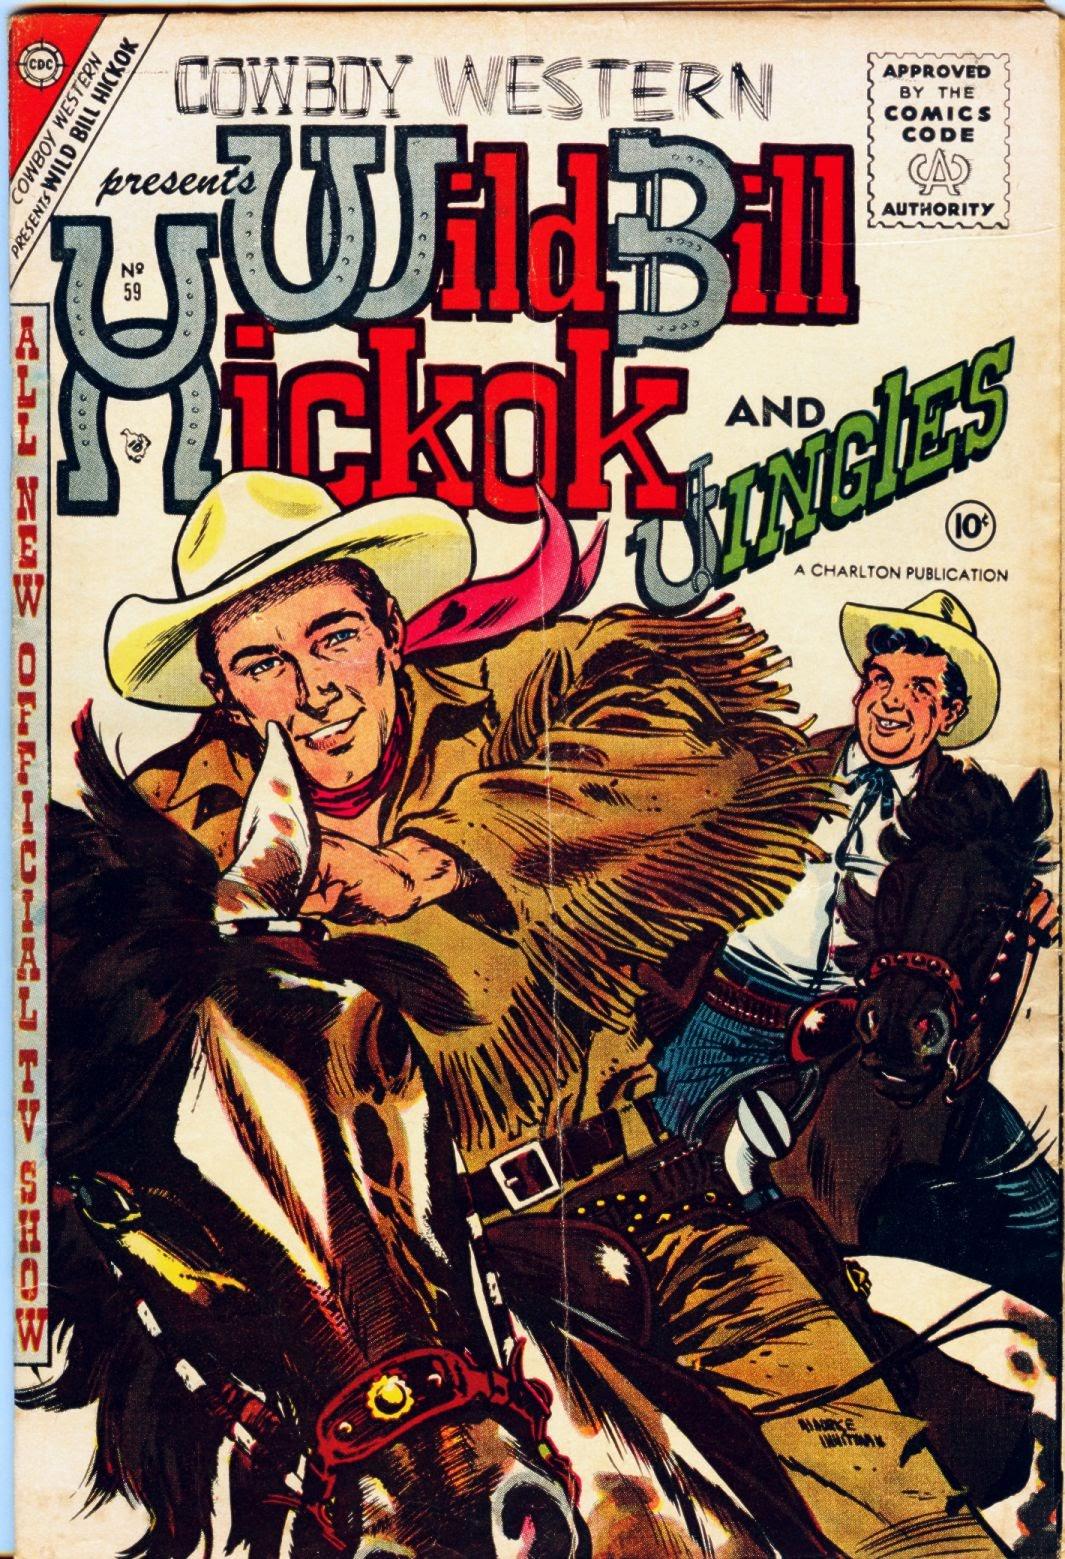 Cowboy Western 59 Page 1